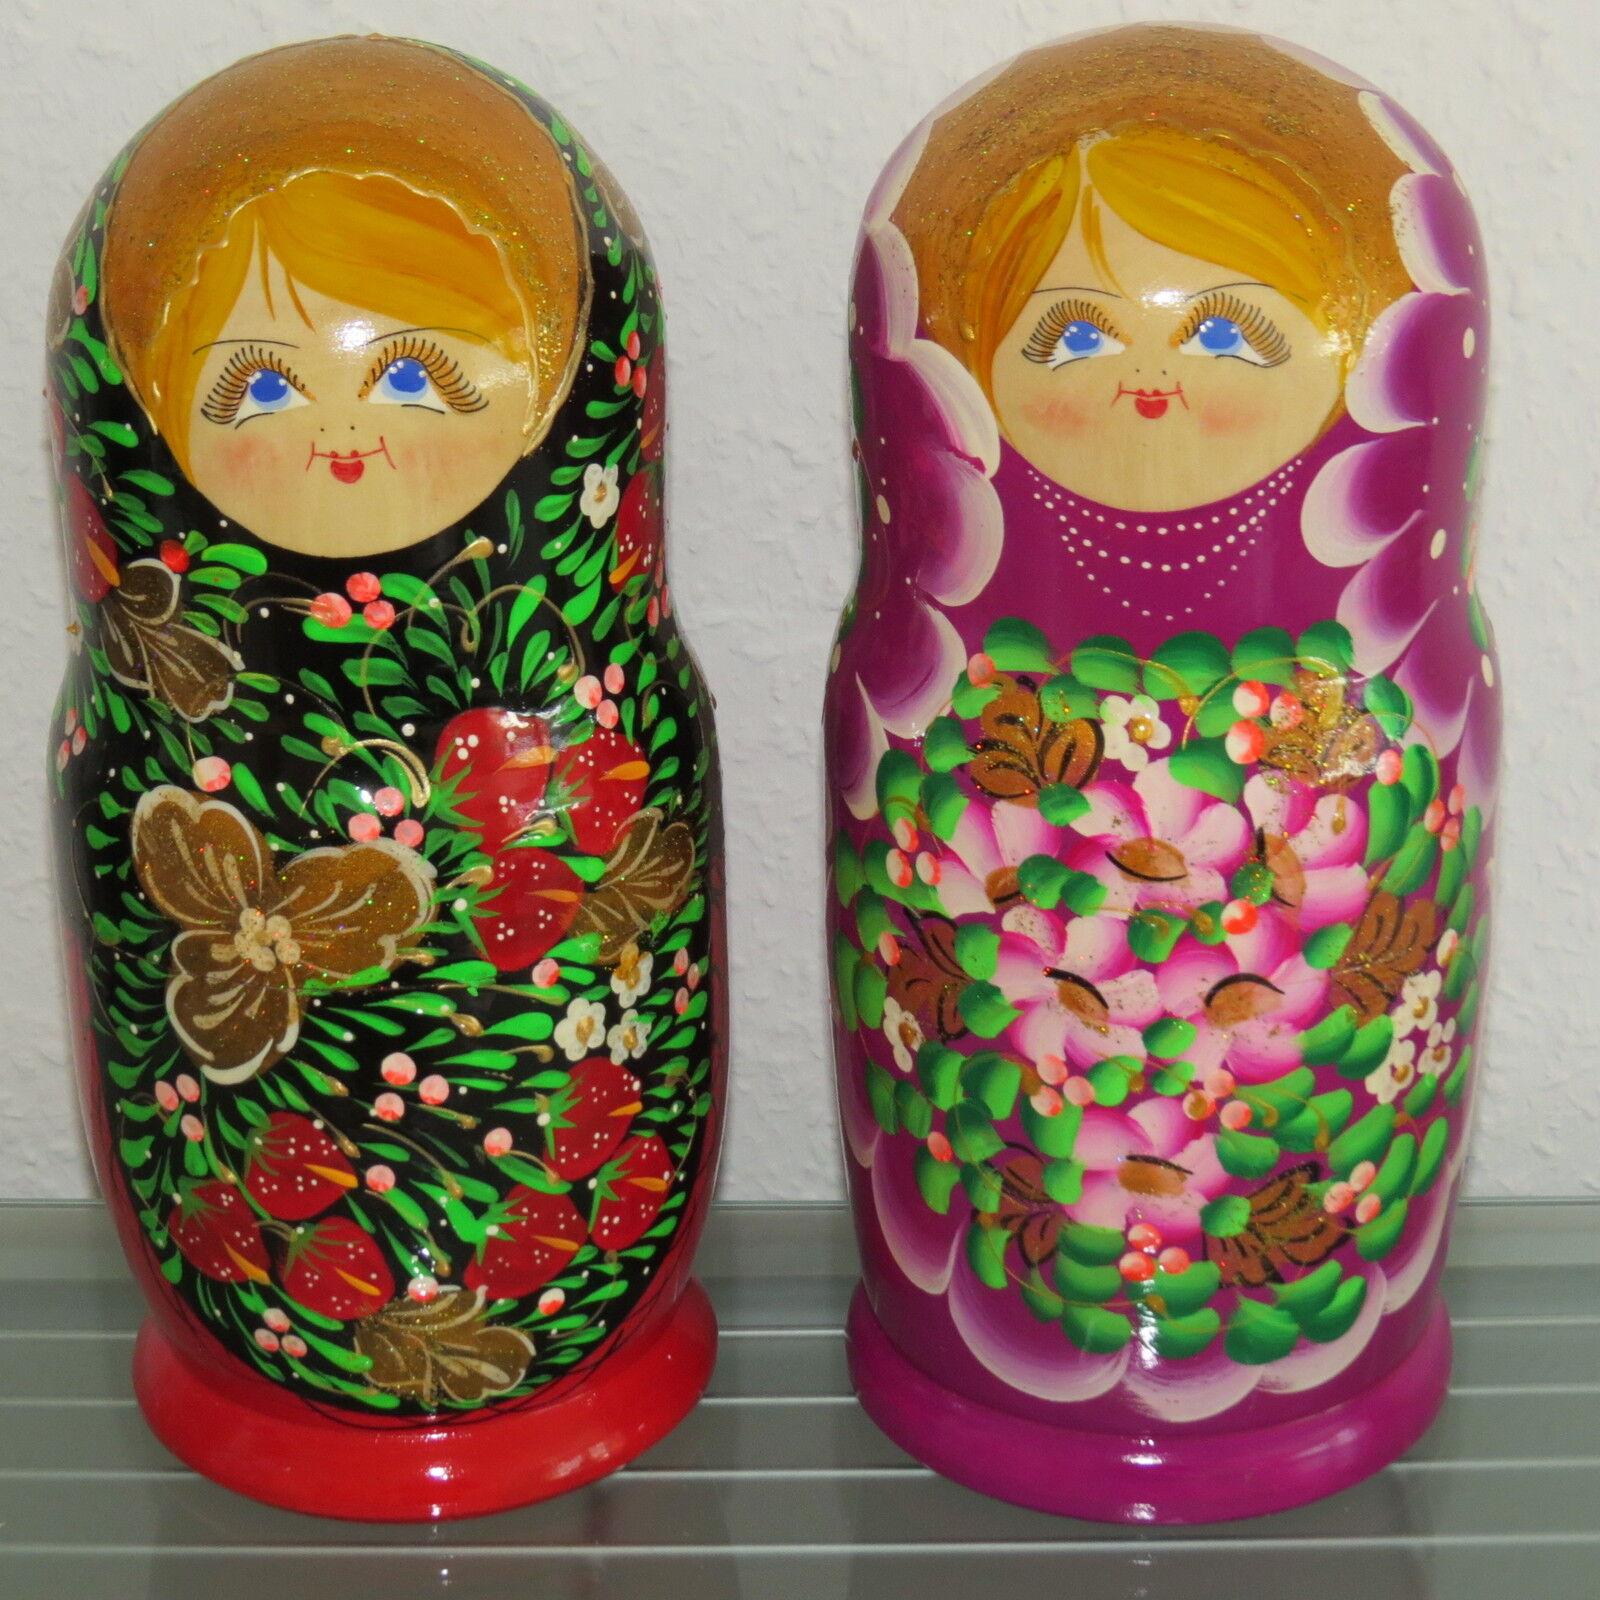 Baautobuschka MATRIOSKA cioé matruschka bambole russa 10 pezzi 10  pezzi  marche online vendita a basso costo